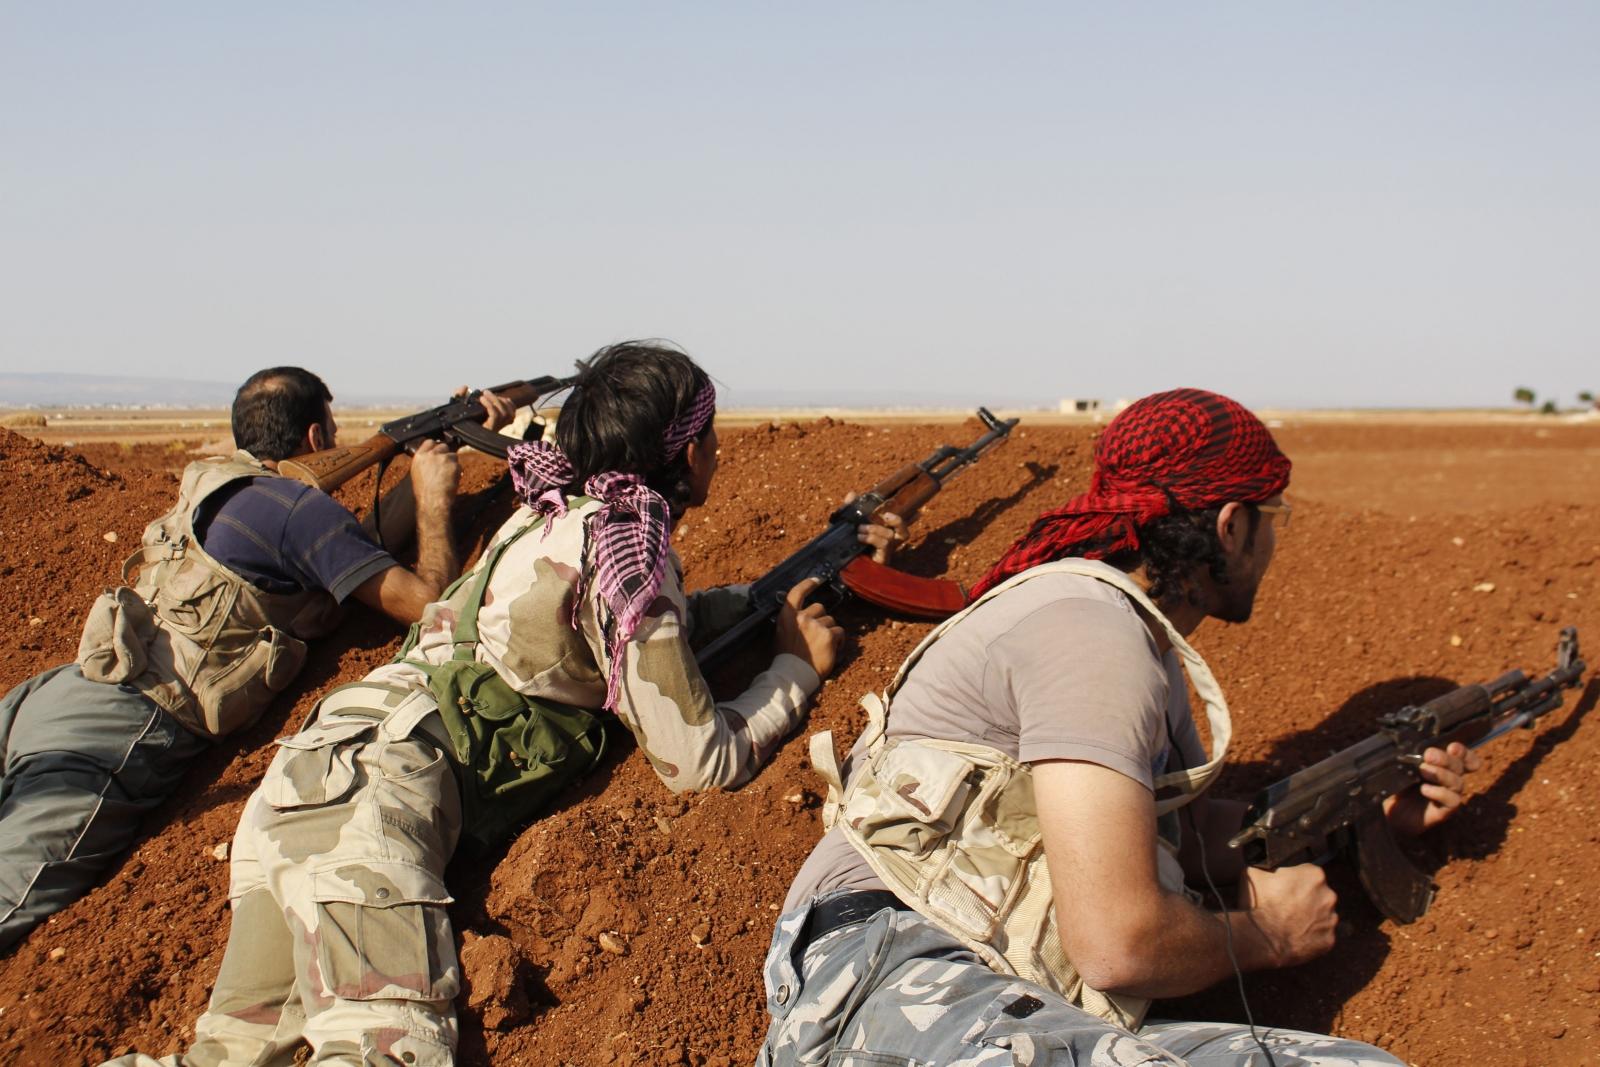 Fierce fighting between ISIS and Syrian rebels